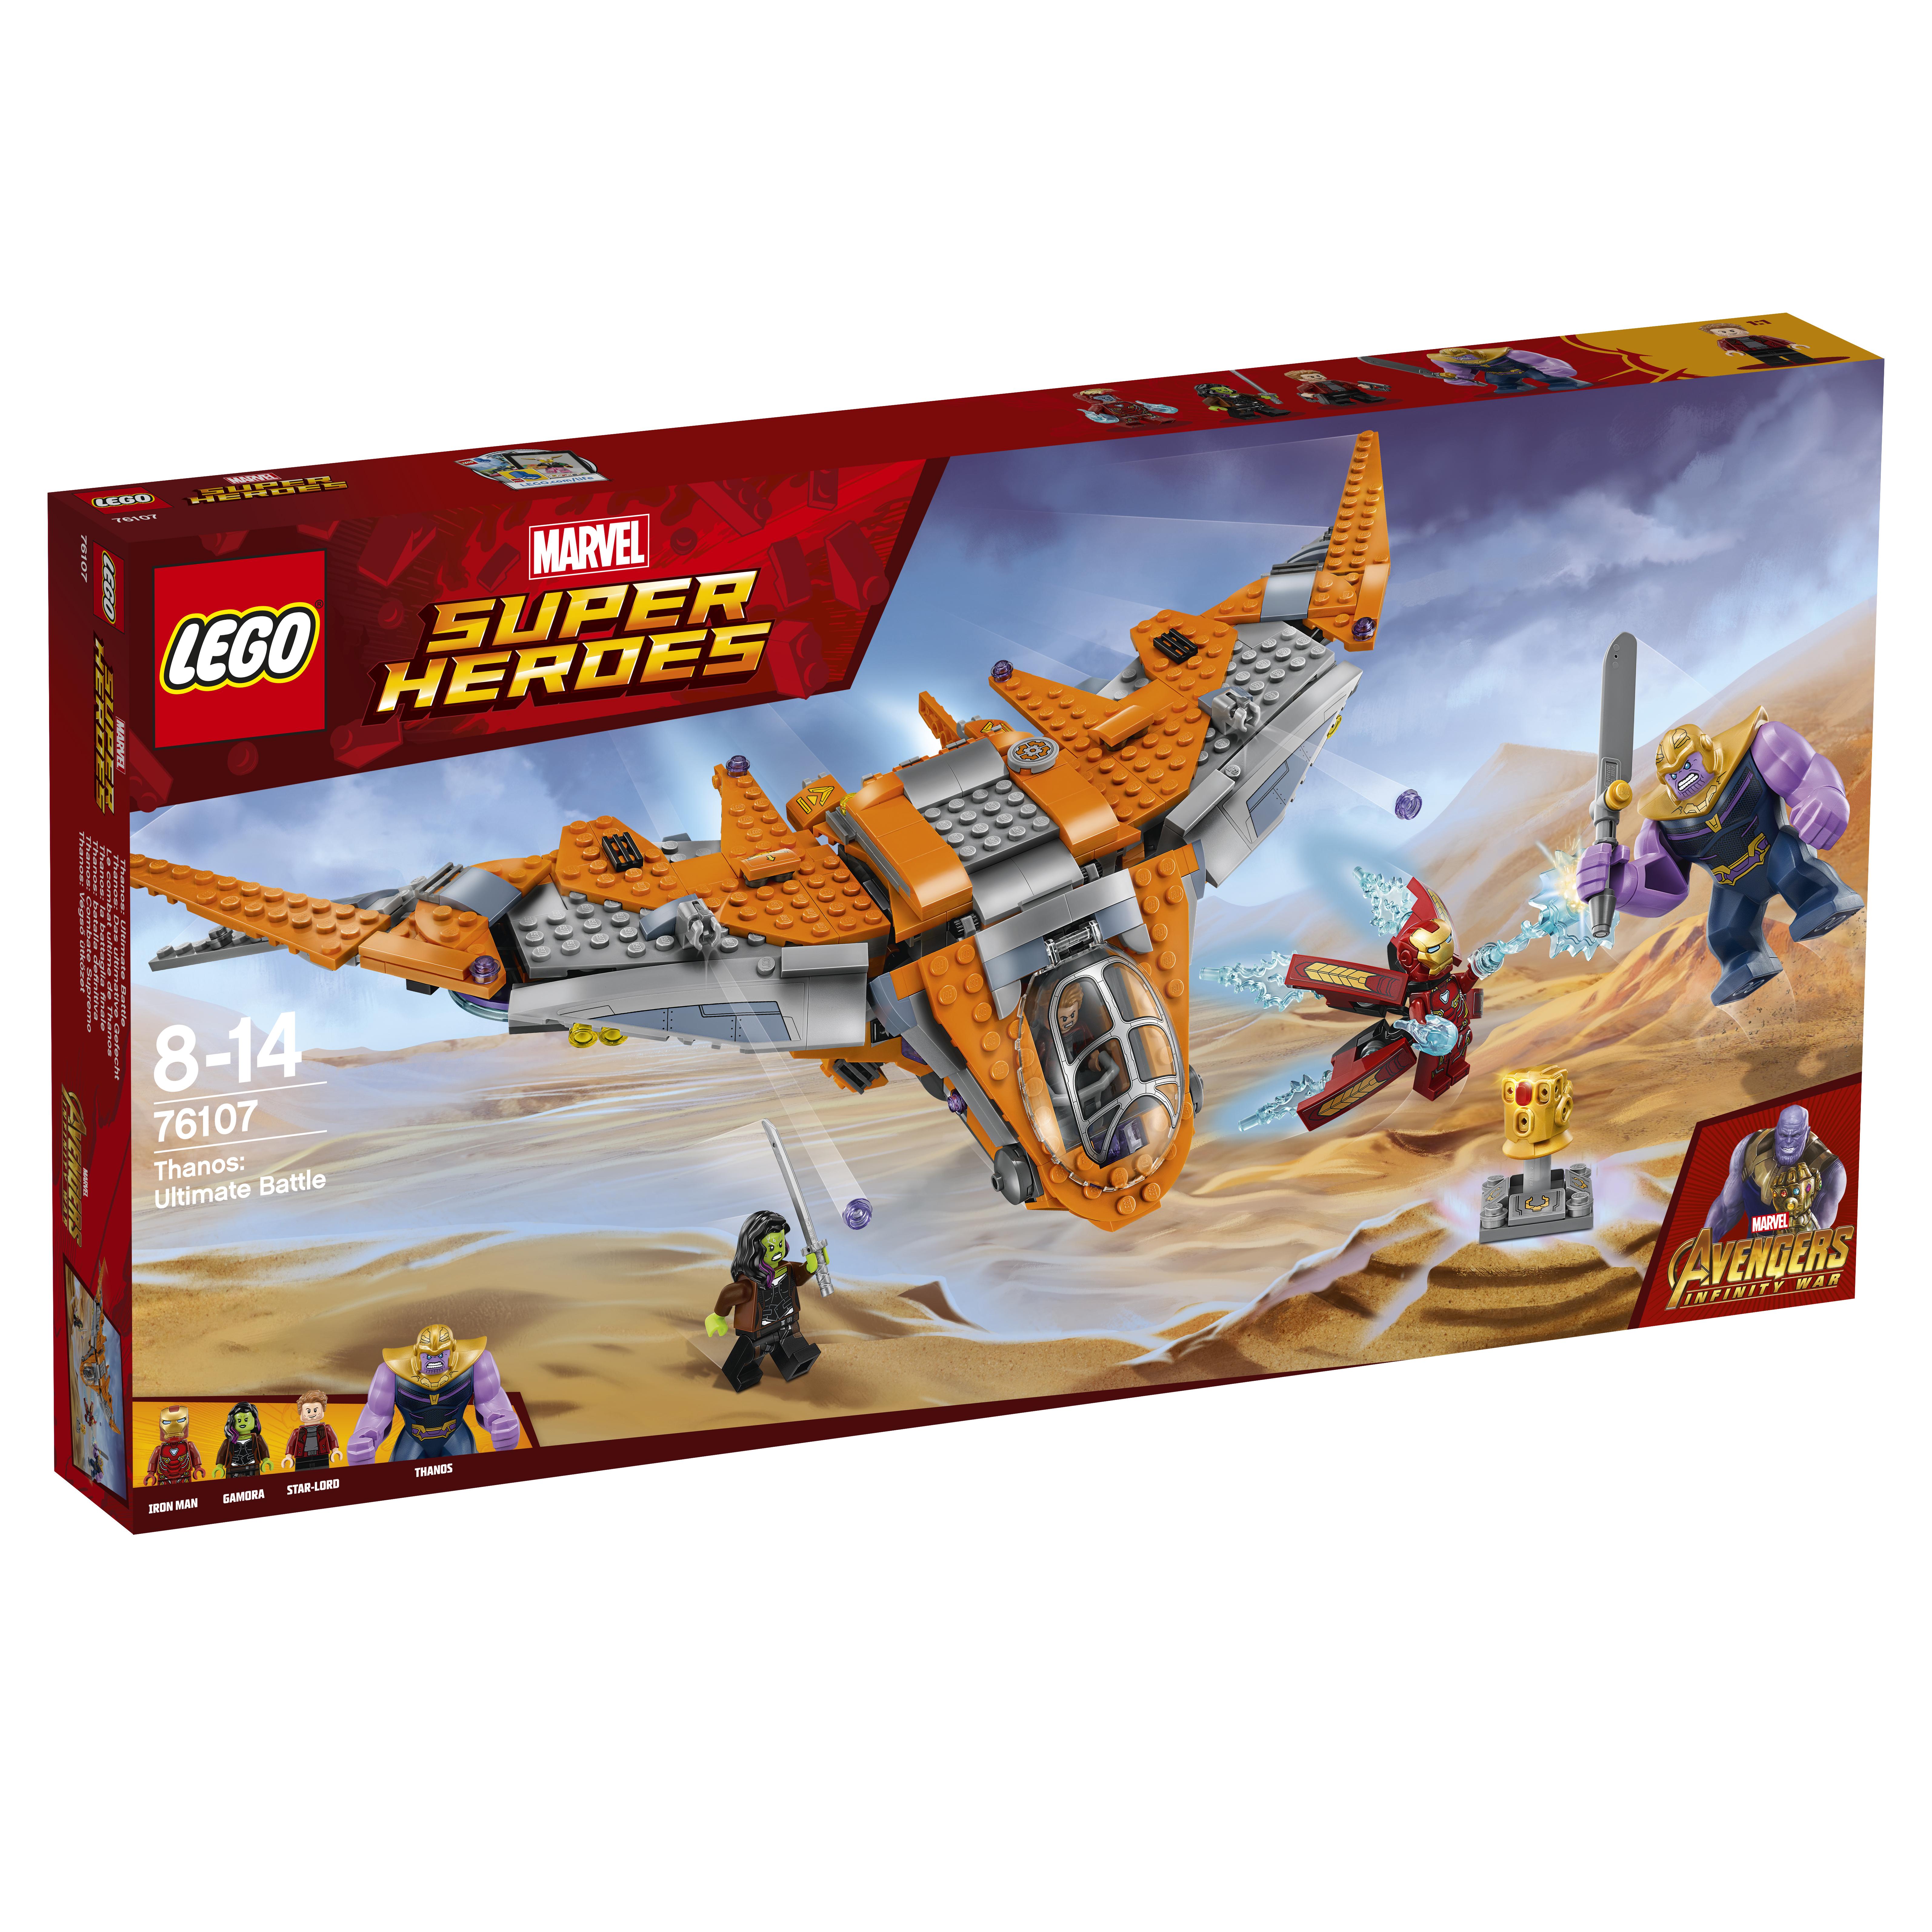 Конструктор LEGO 76107 Танос: последняя битва конструктор lego танос